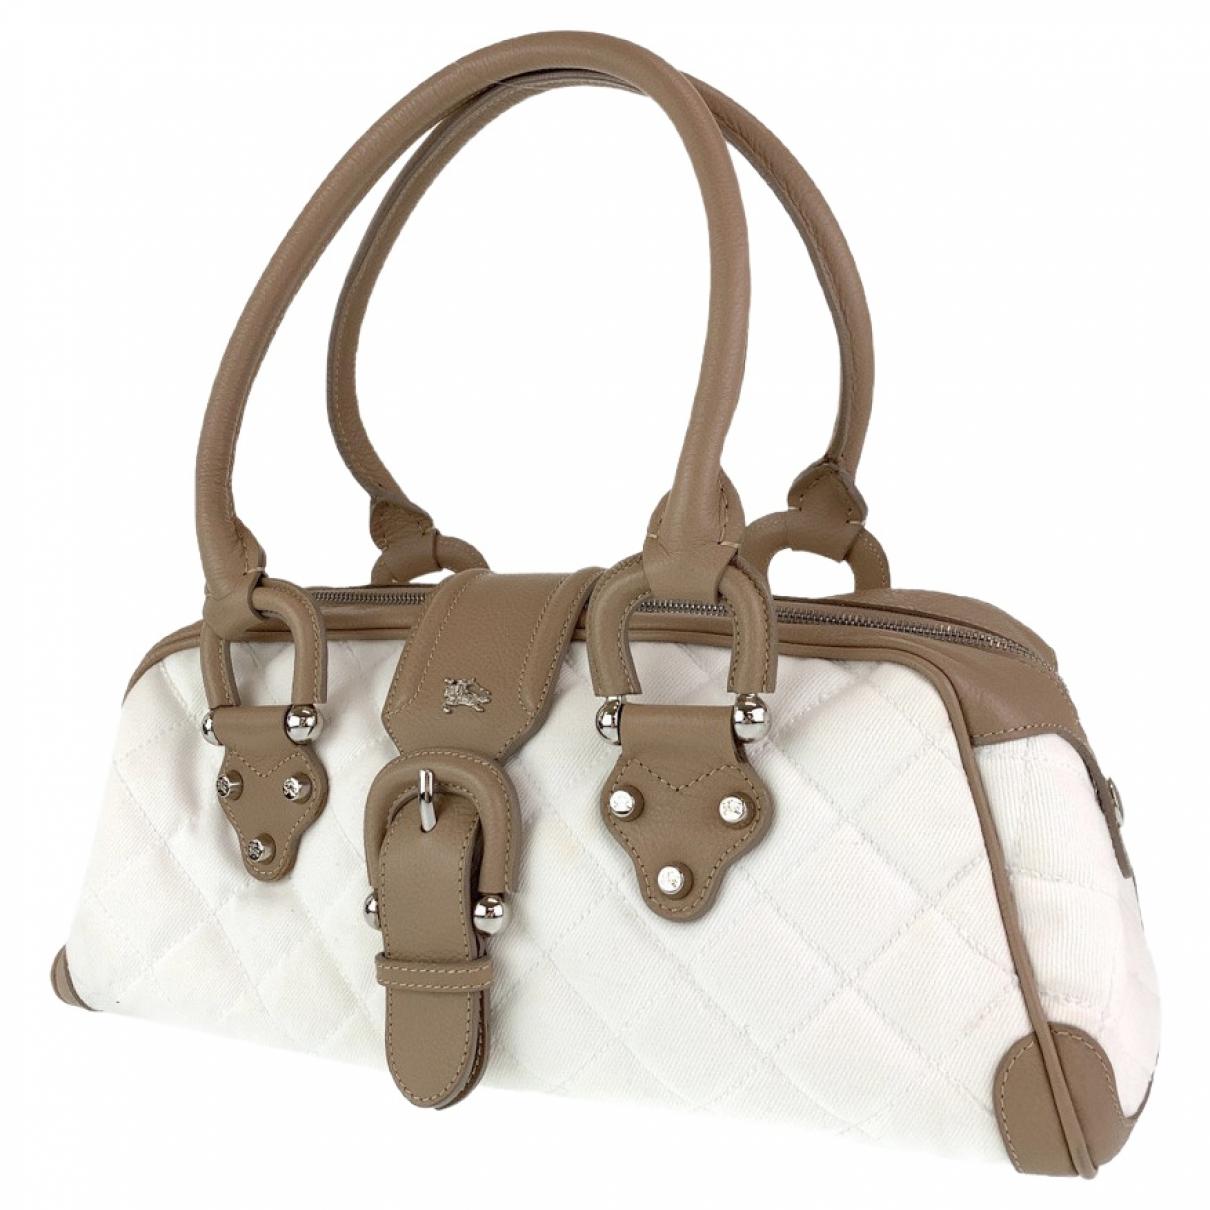 Burberry \N Leather handbag for Women \N